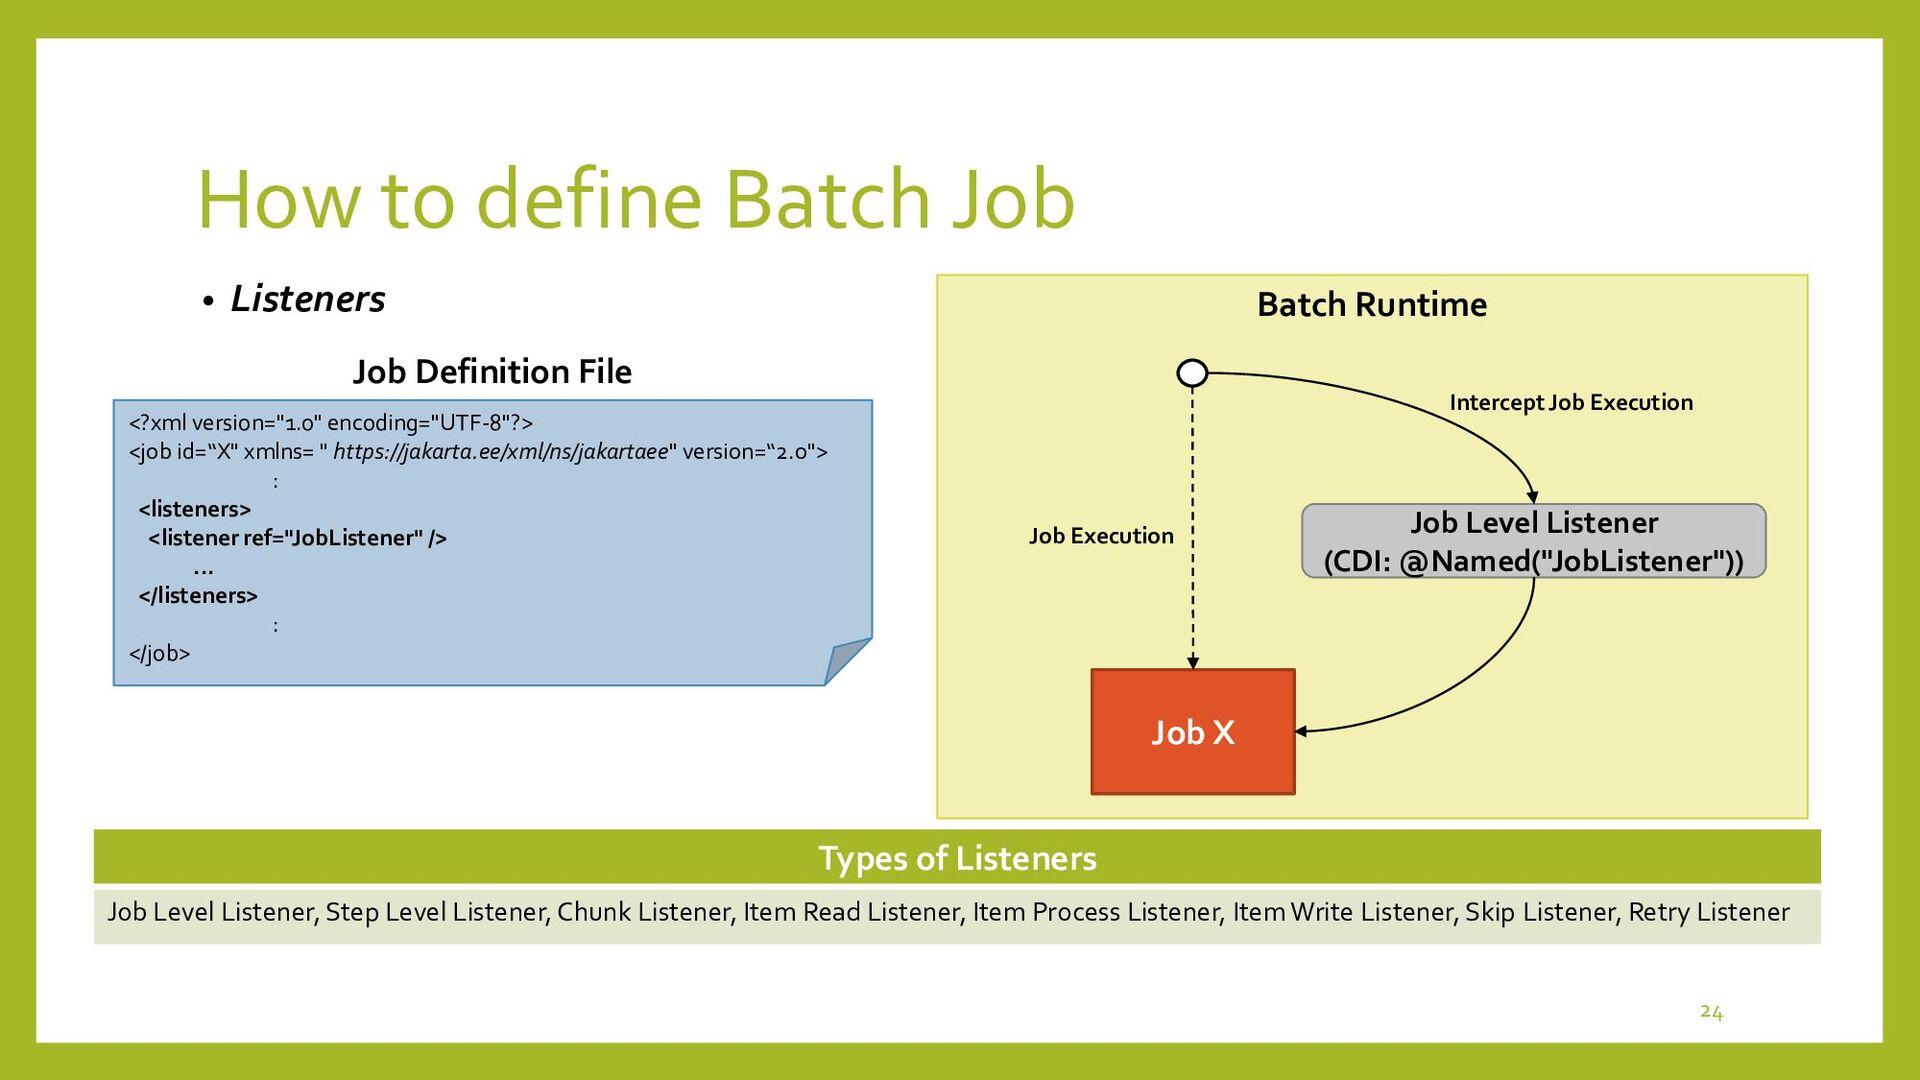 Batch Runtime Job X Job Execution How to define...